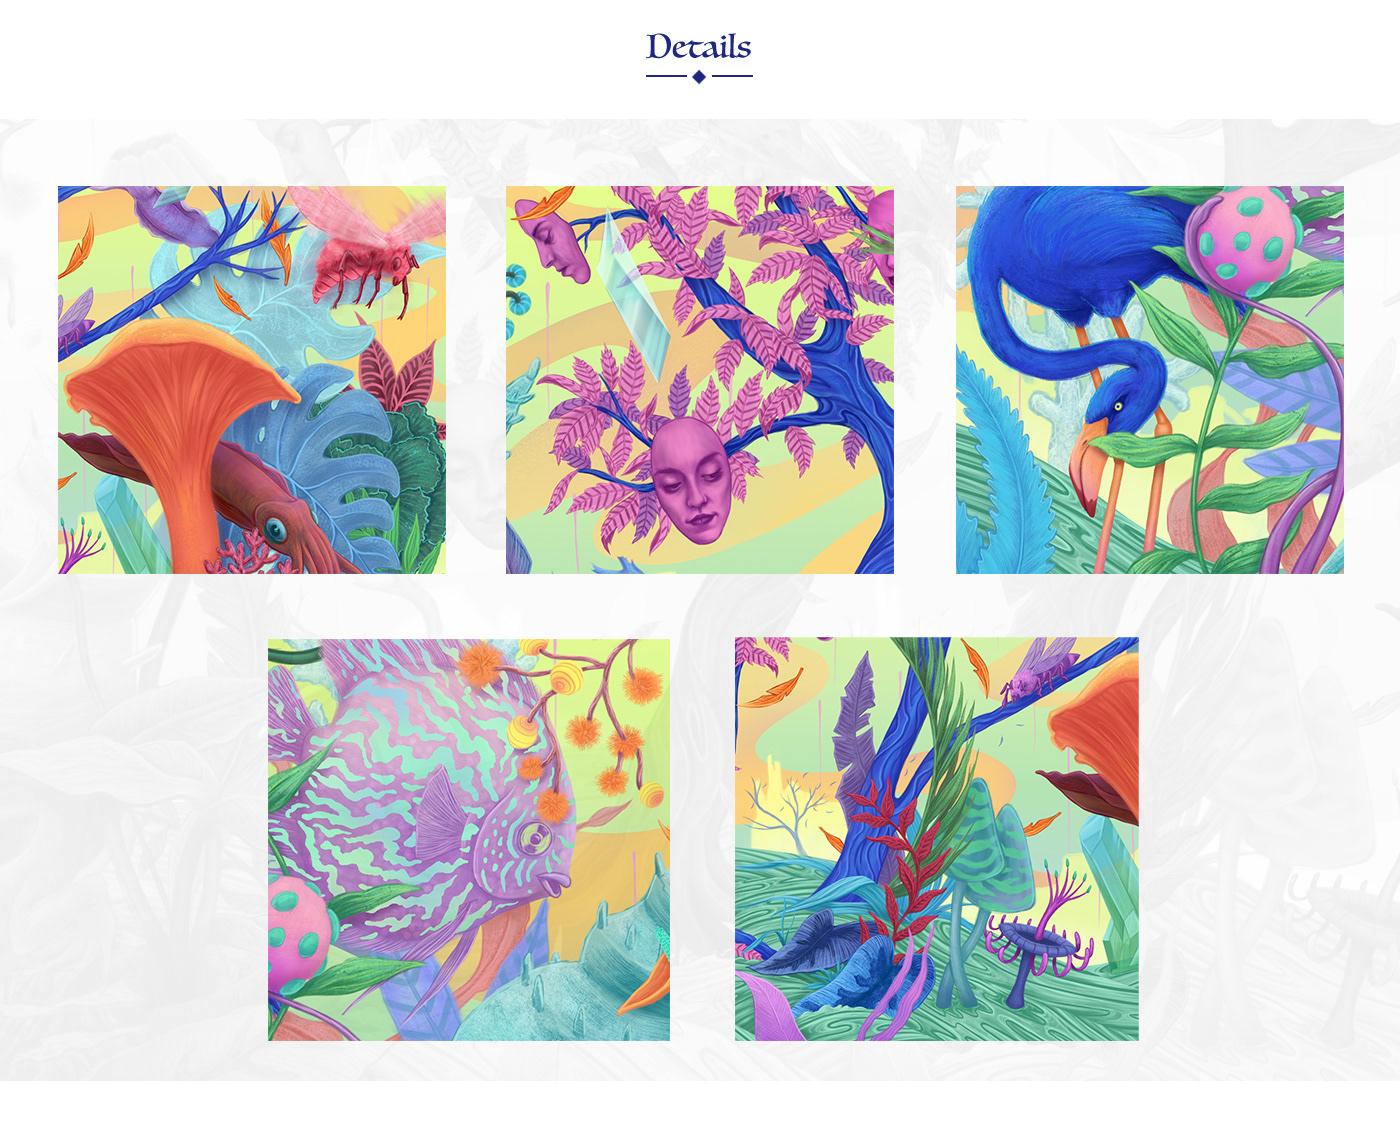 art colors digital illustration digitalpainting Drawing  fantasy Nature Packaging painting   surrealism